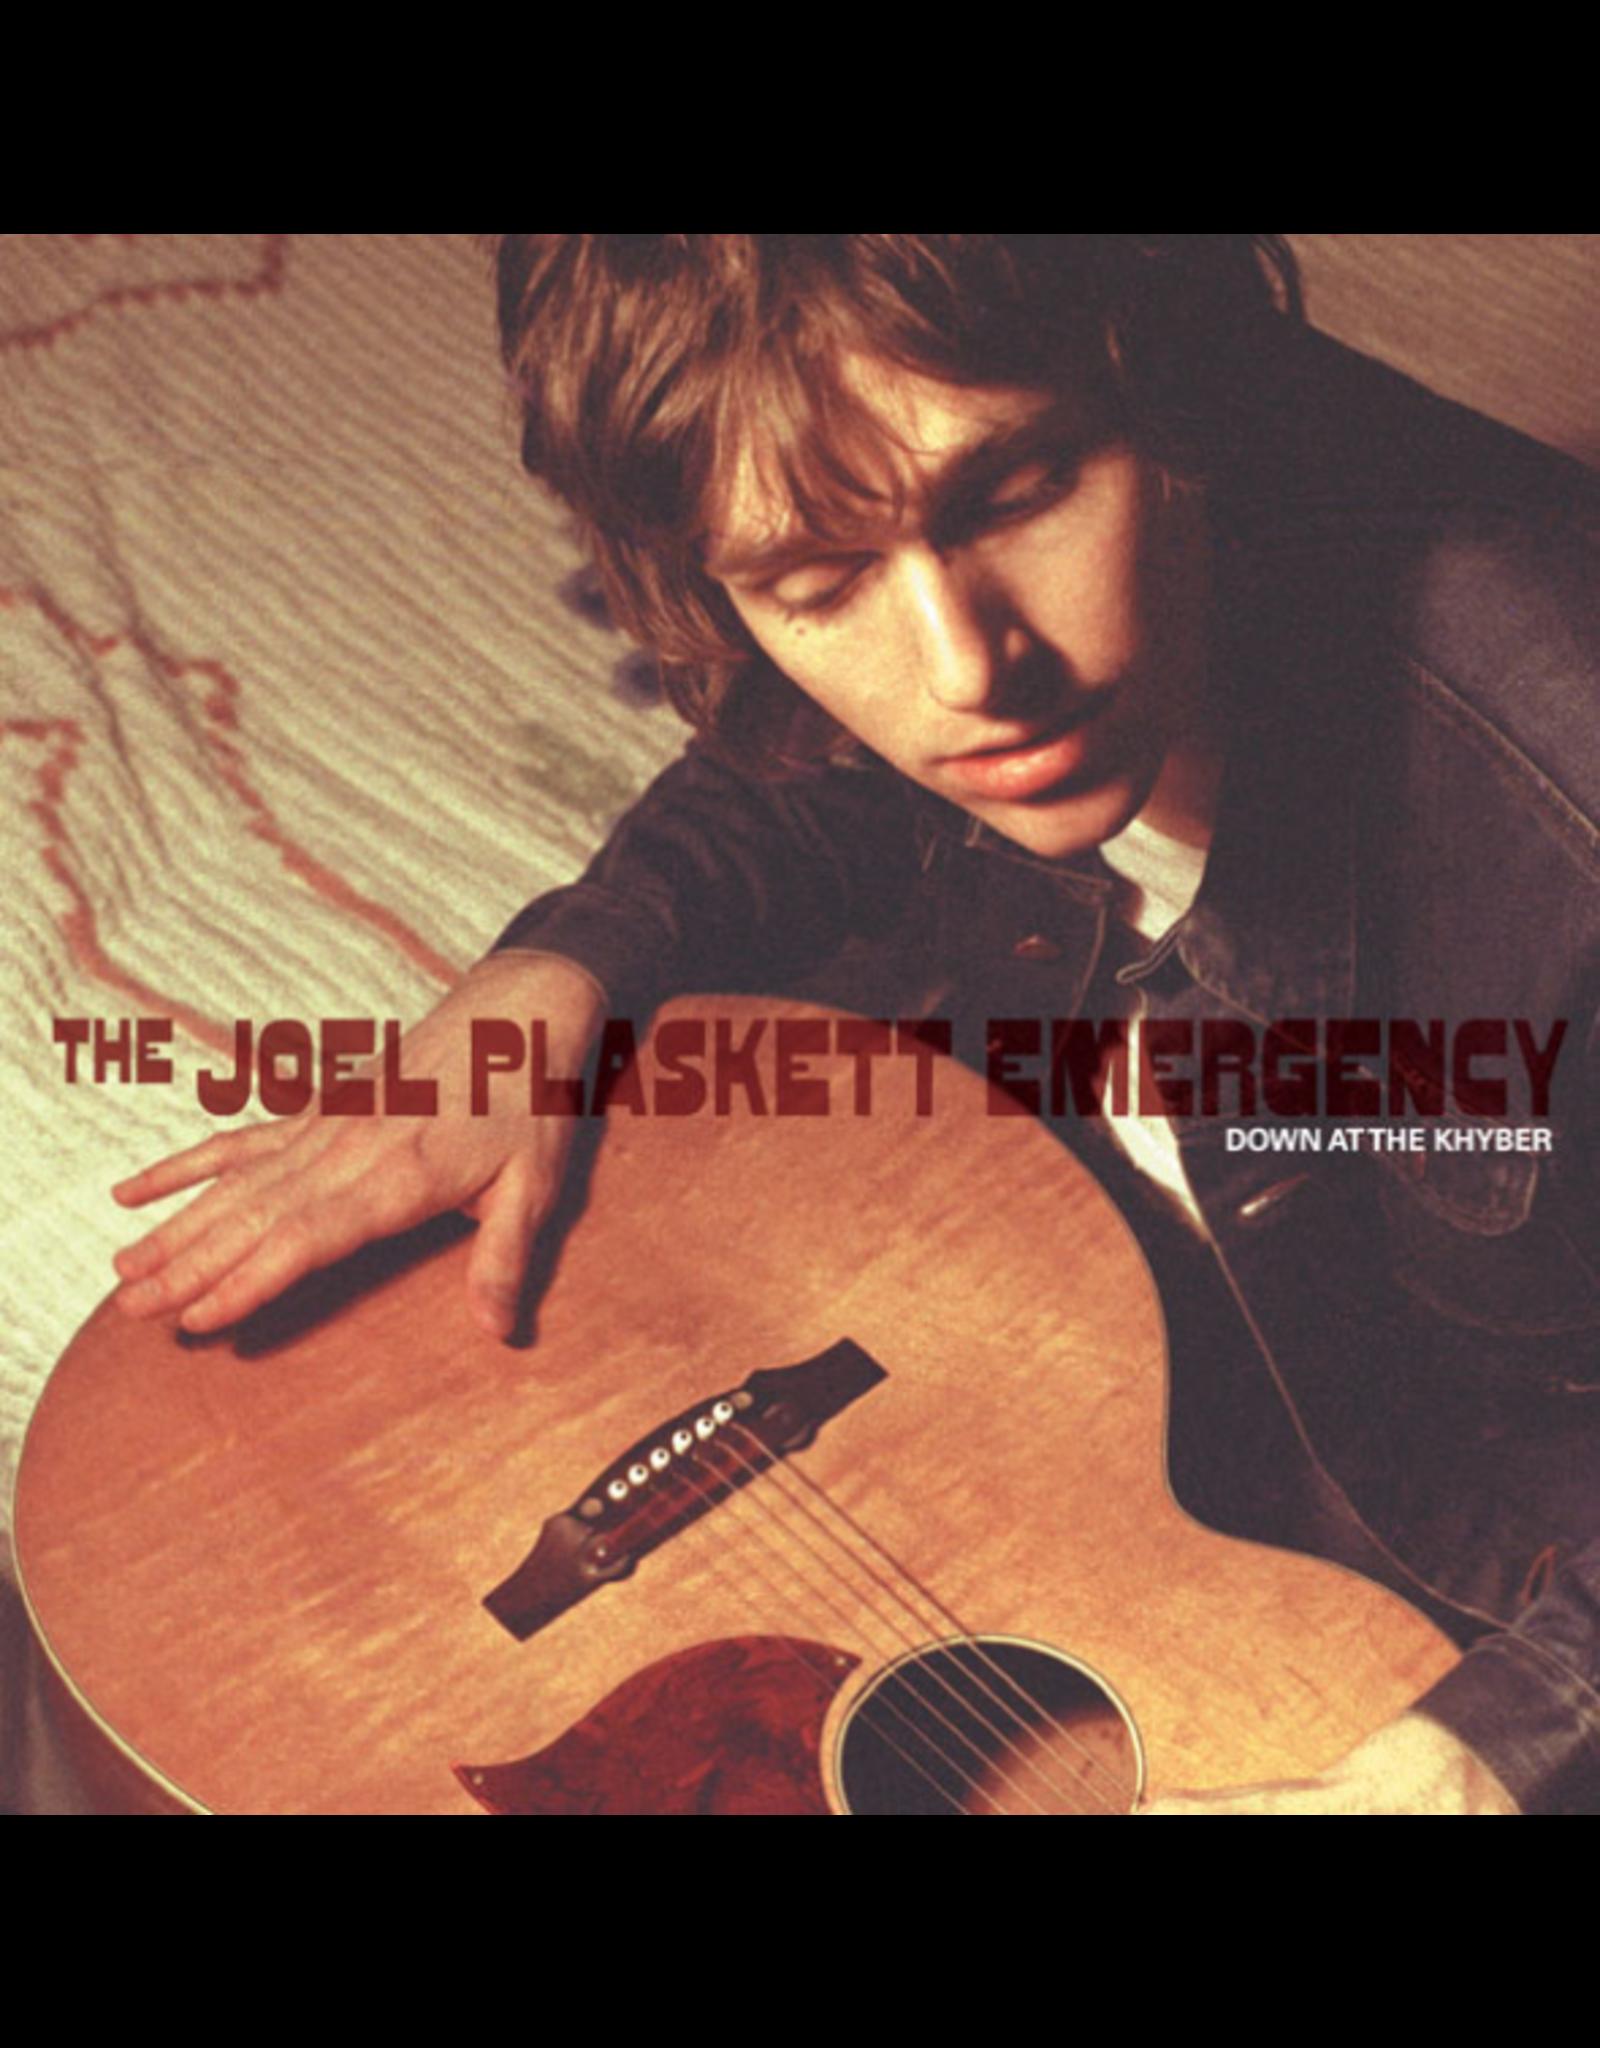 Plaskett, Joel - Down the Khyber LP